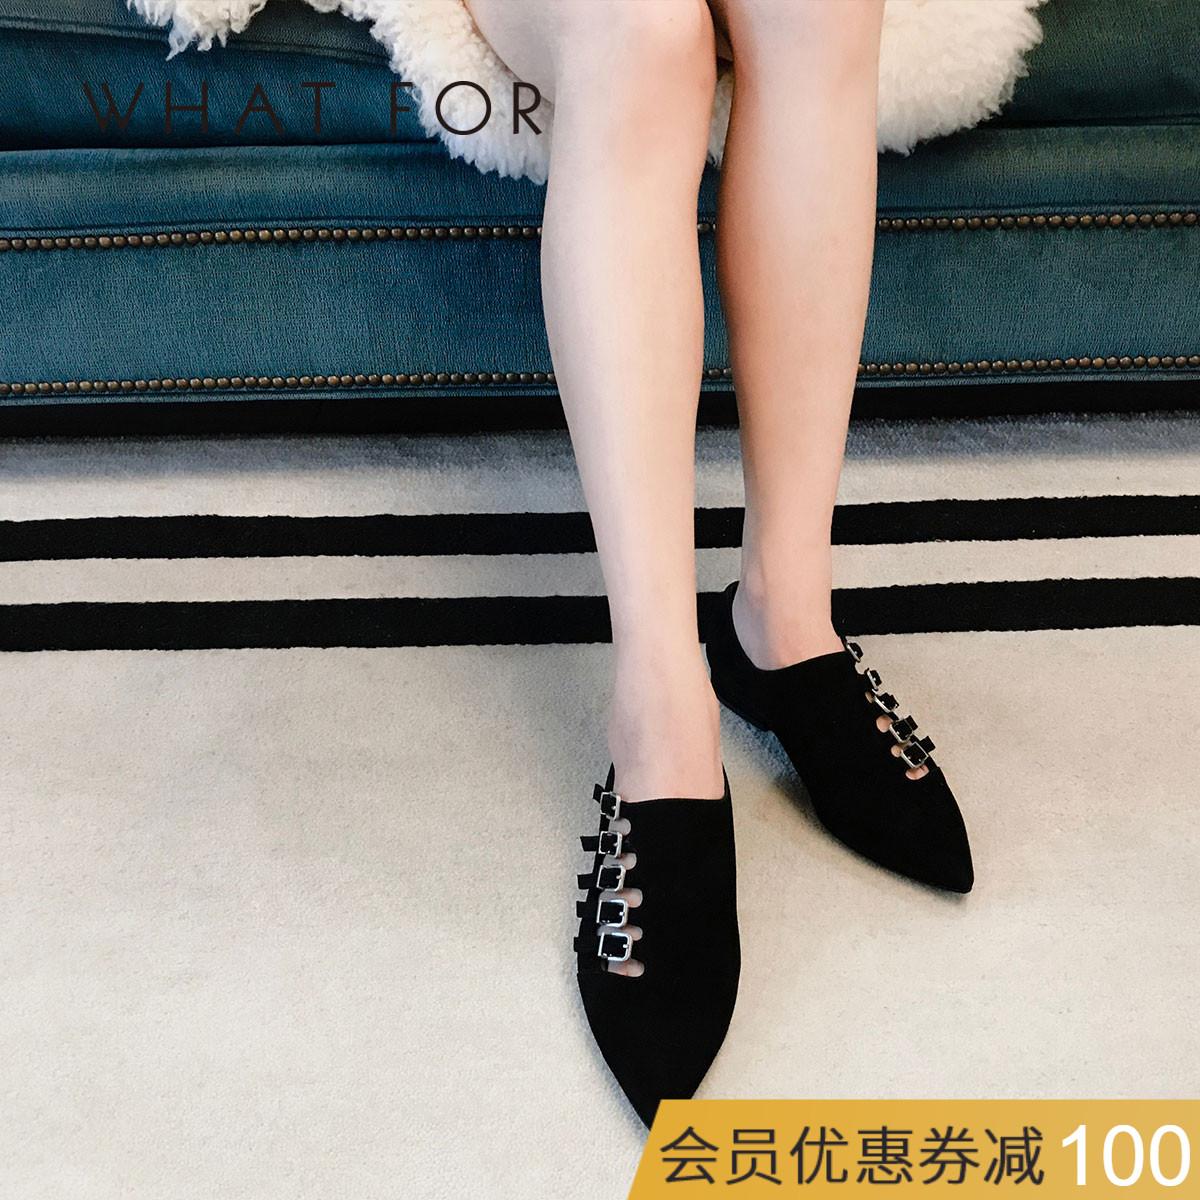 WHAT FOR夏季季羊反毛尖头平底低跟女士镂空时尚百搭简约深口单鞋